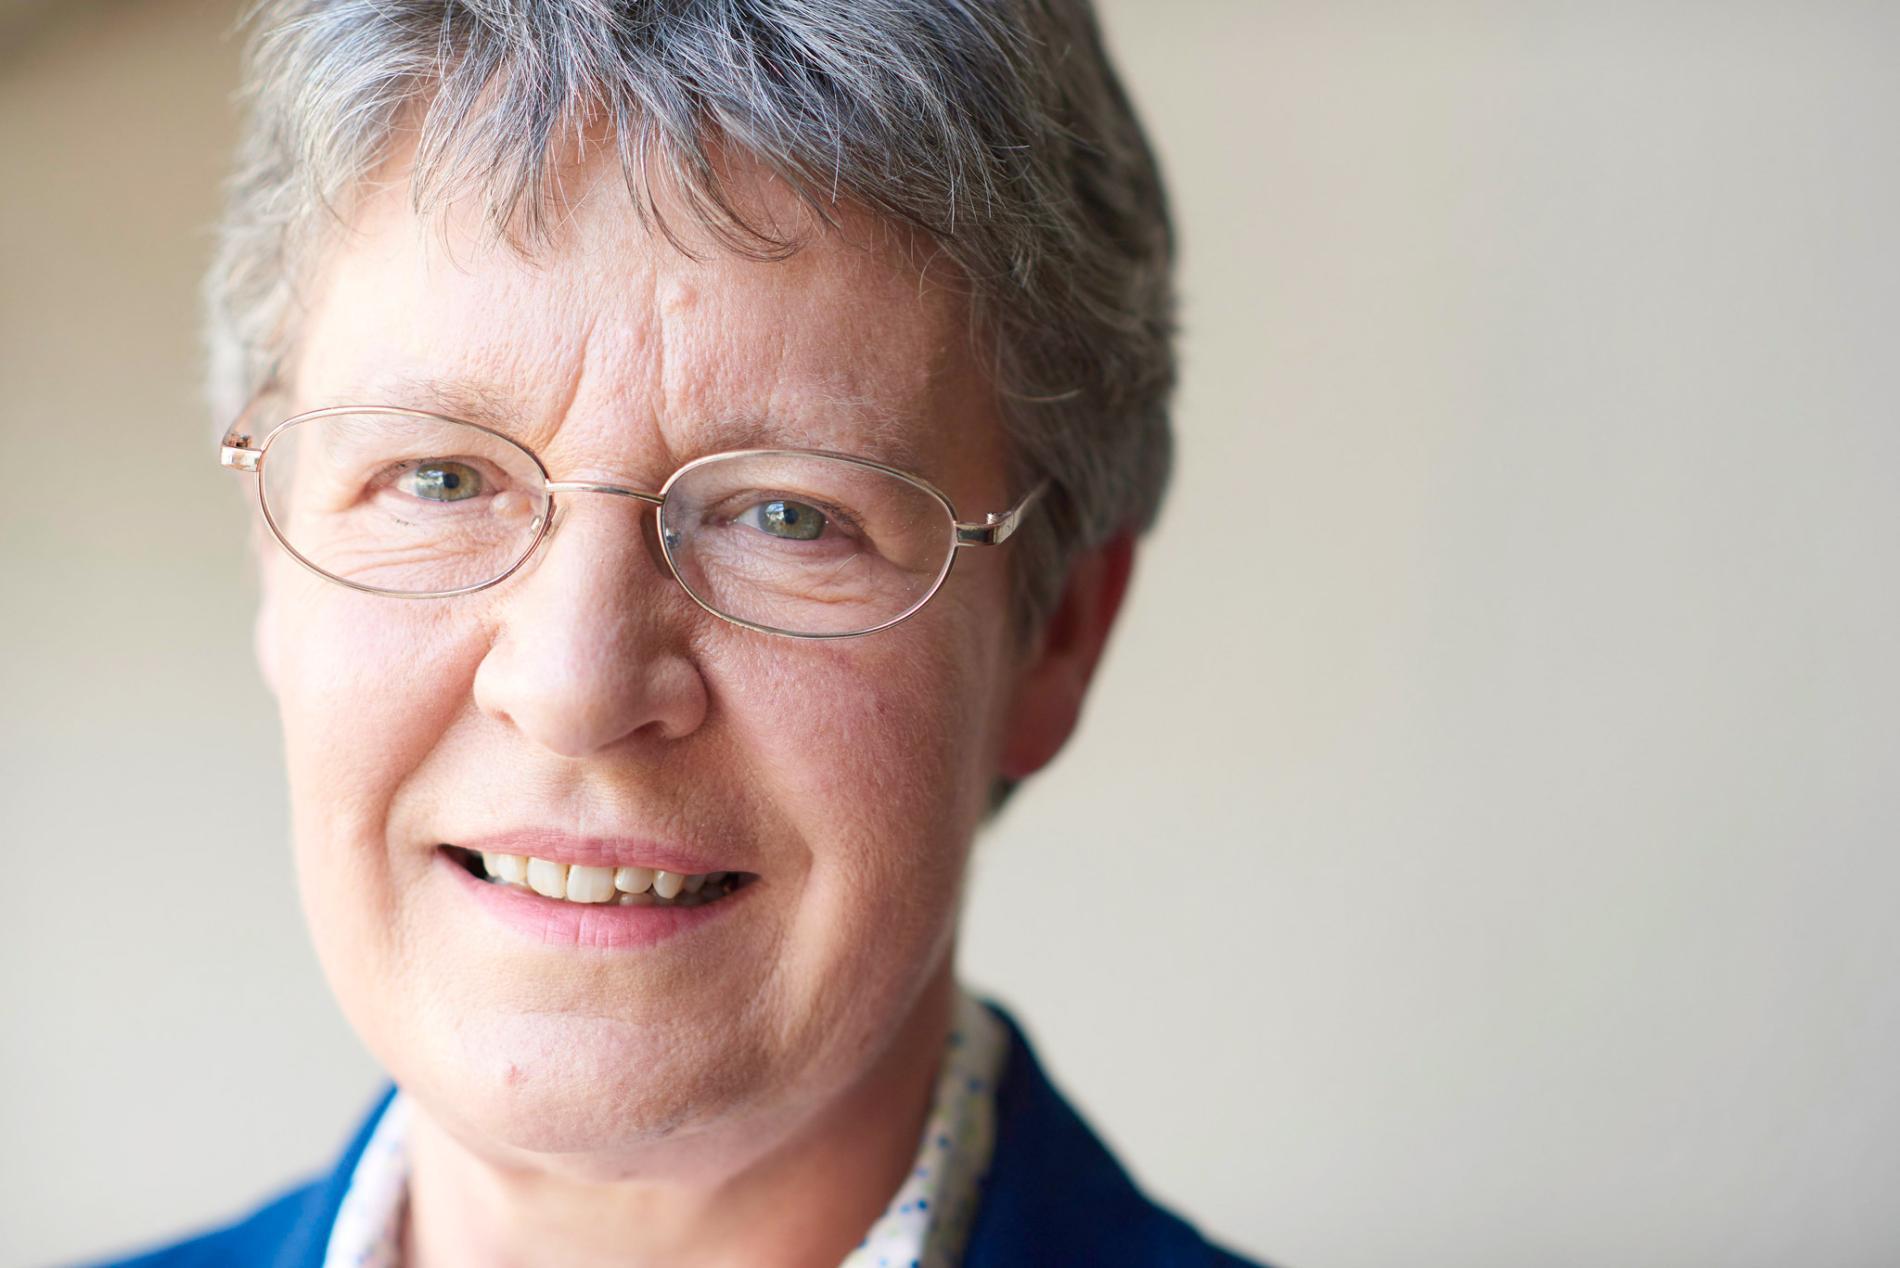 Mulheres que mudaram a engenharia e a ciência: Jocelyn Bell Burnell